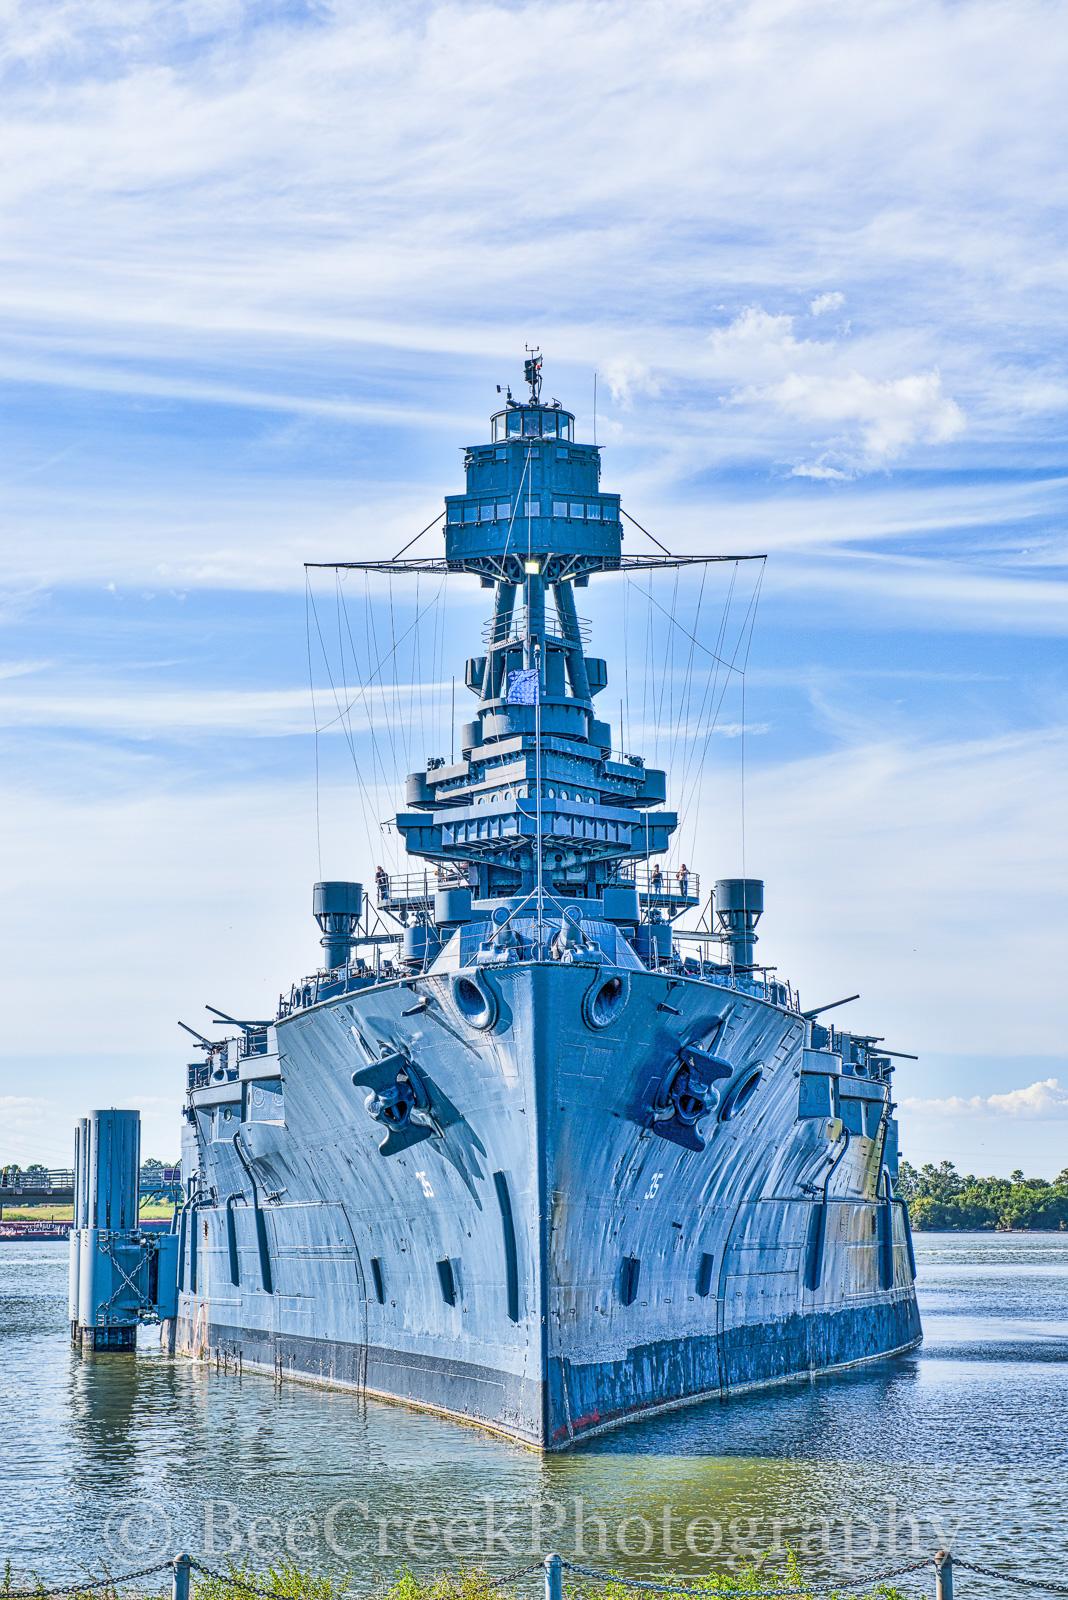 Battleship Texas, WWW1, WWW2, gun, historic, landmark, museum, ship channel, wars, photo